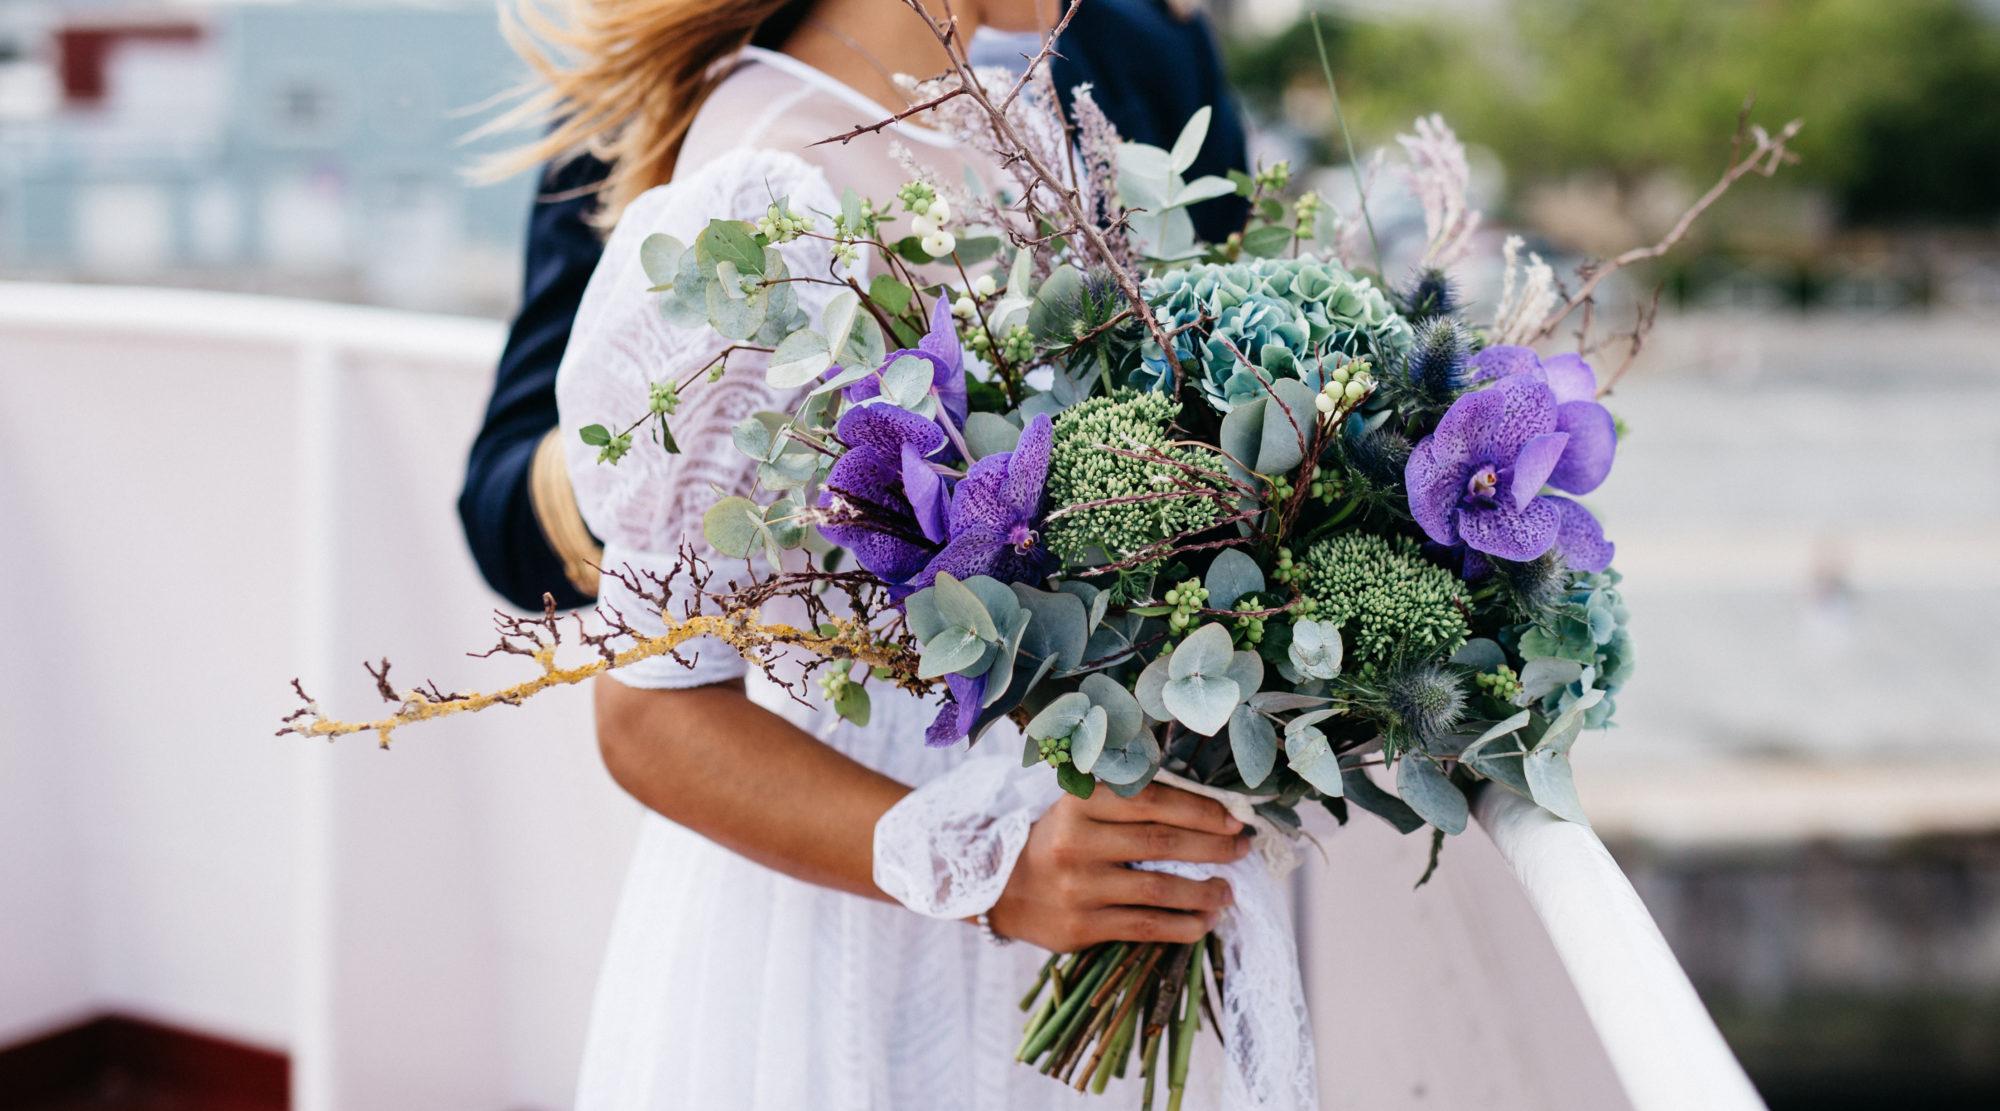 Buchet de flori pentru aniversari